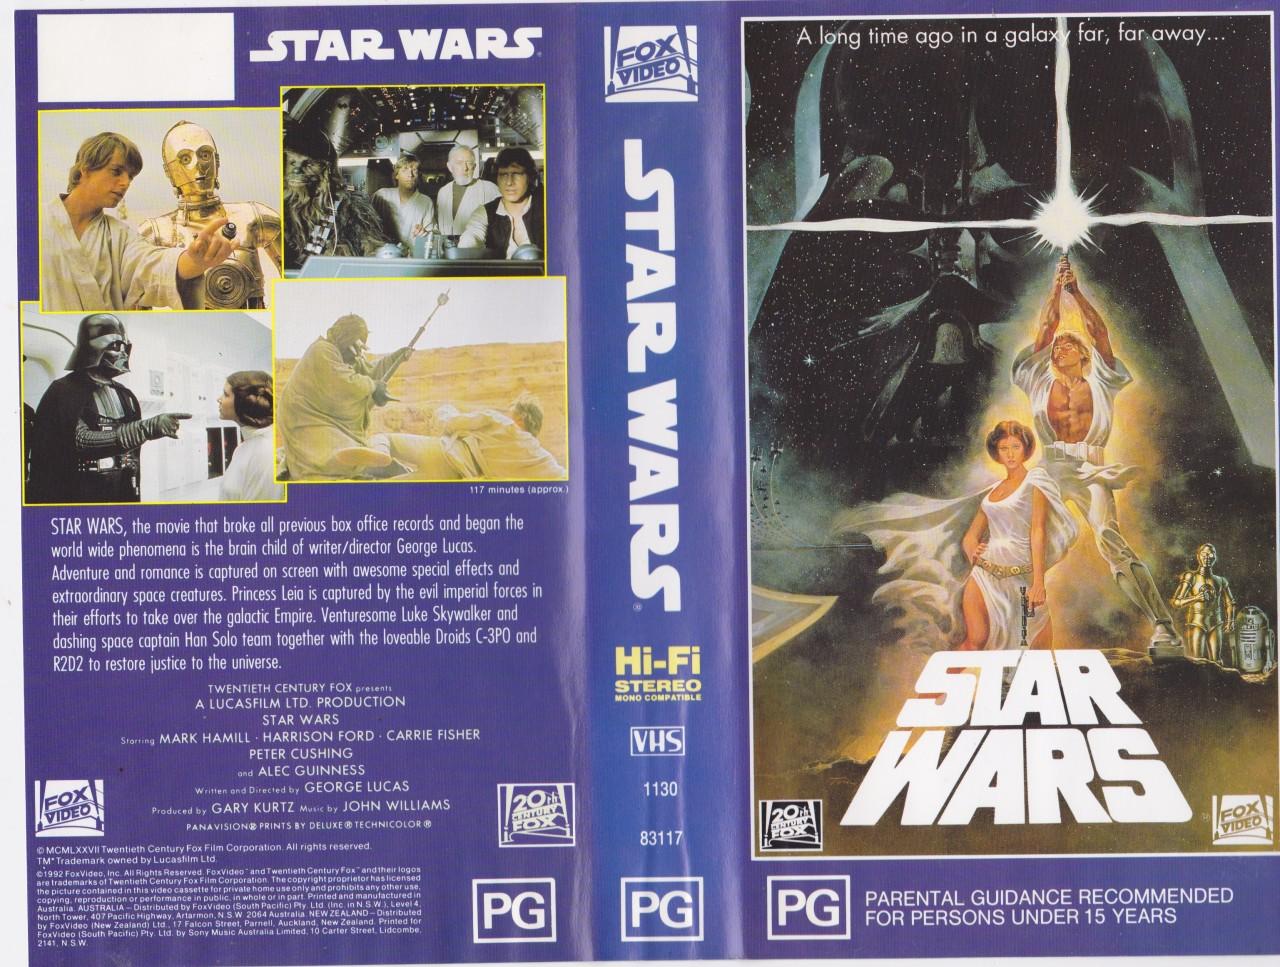 STAR-WARS-VHS-PAL-VIDEO-A-RARE-FND